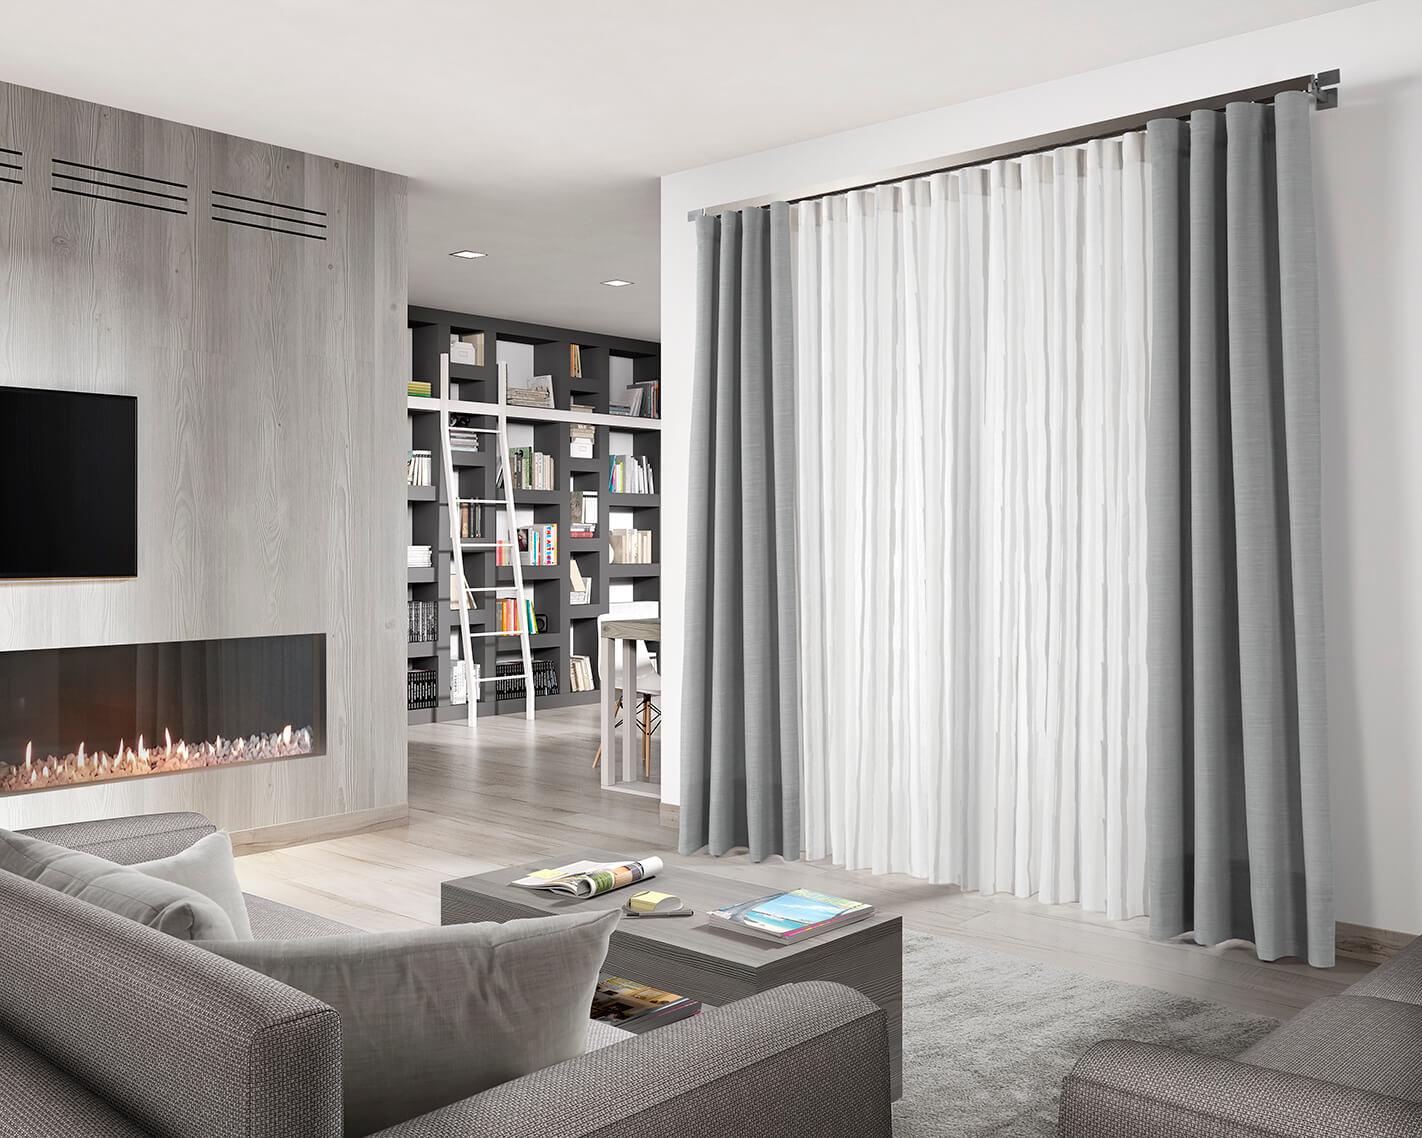 Cortinas de sal n en zaragoza cortinajes com n - Cortinas salon modernas ...